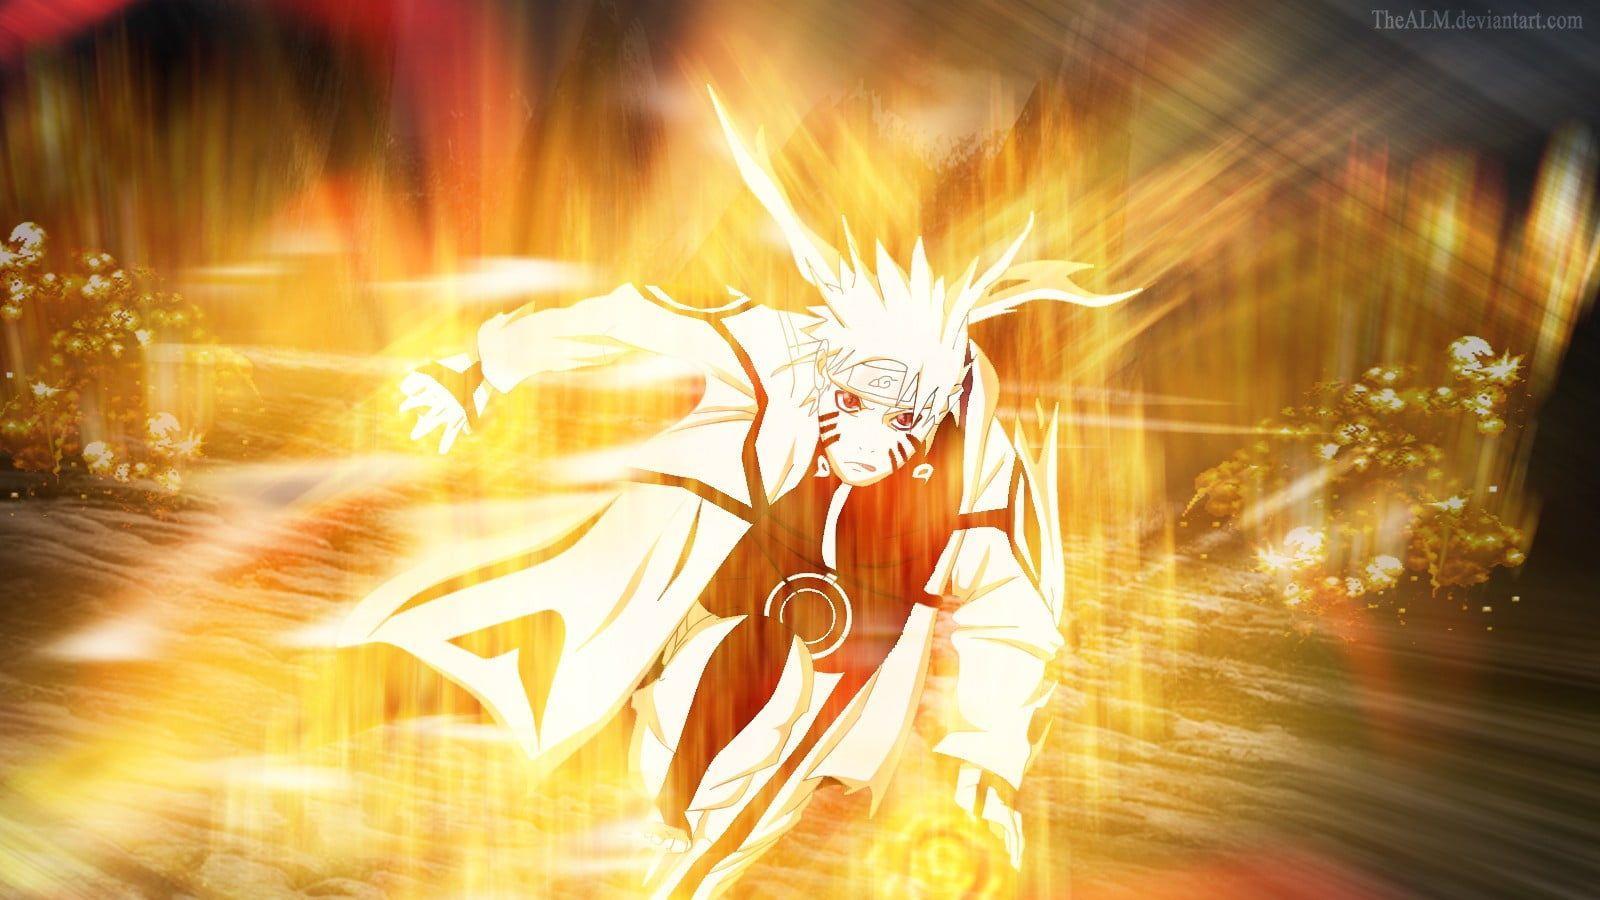 Naruto Nine Tails Wallpapers - Top Free Naruto Nine Tails